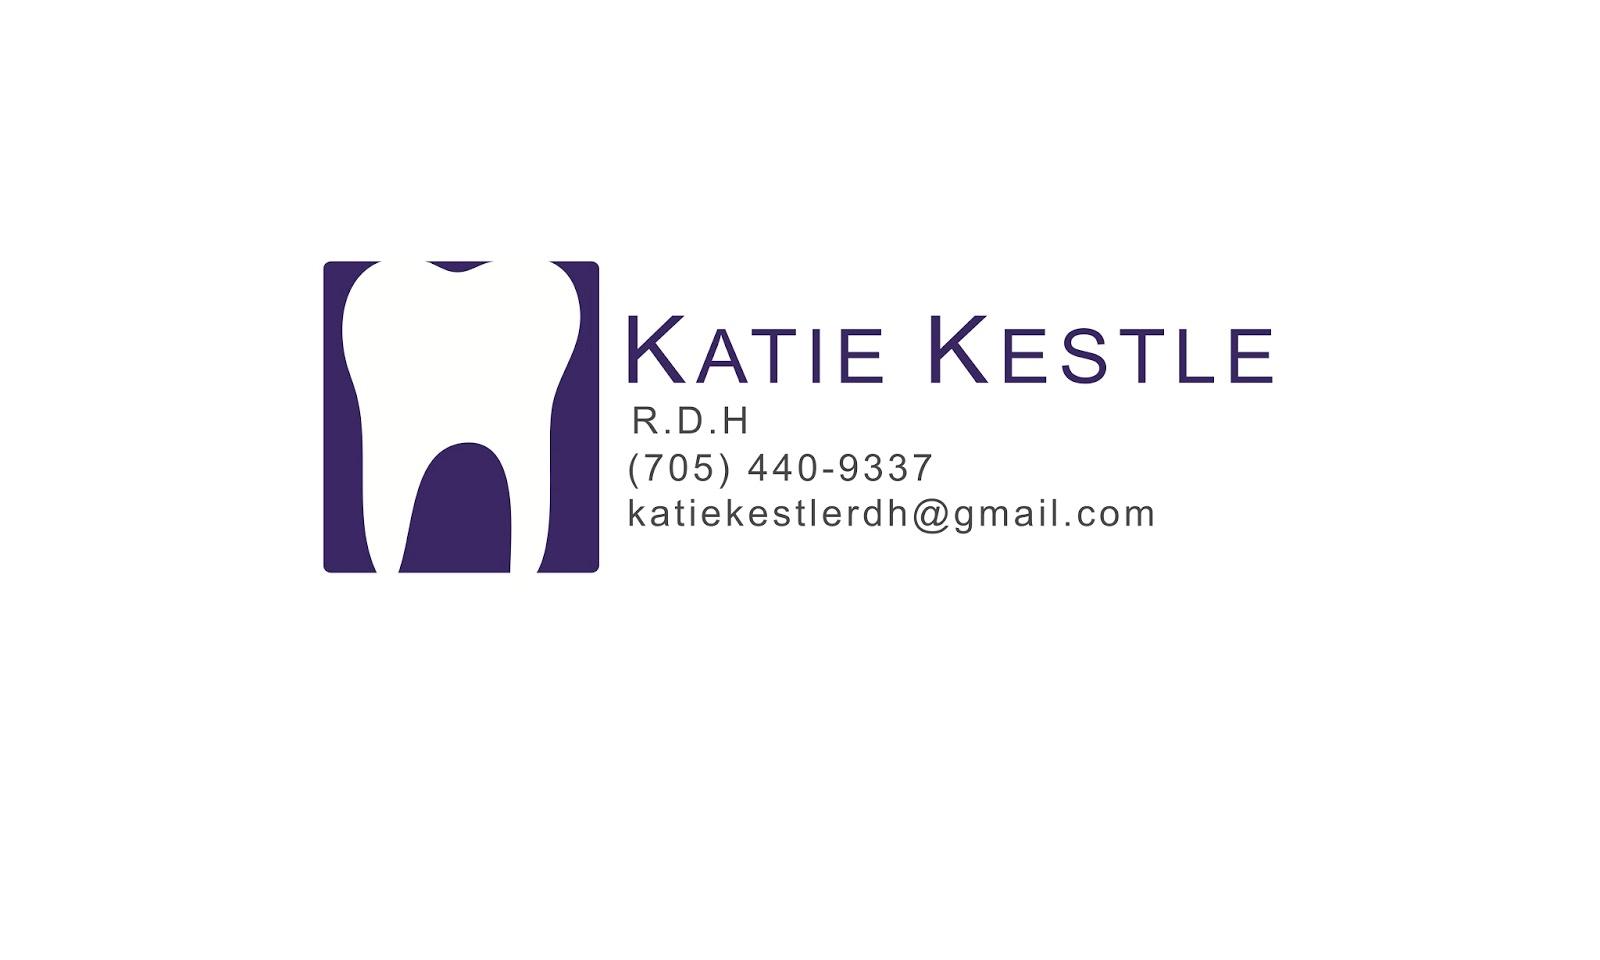 Dental Business Cards - Business Card Tips